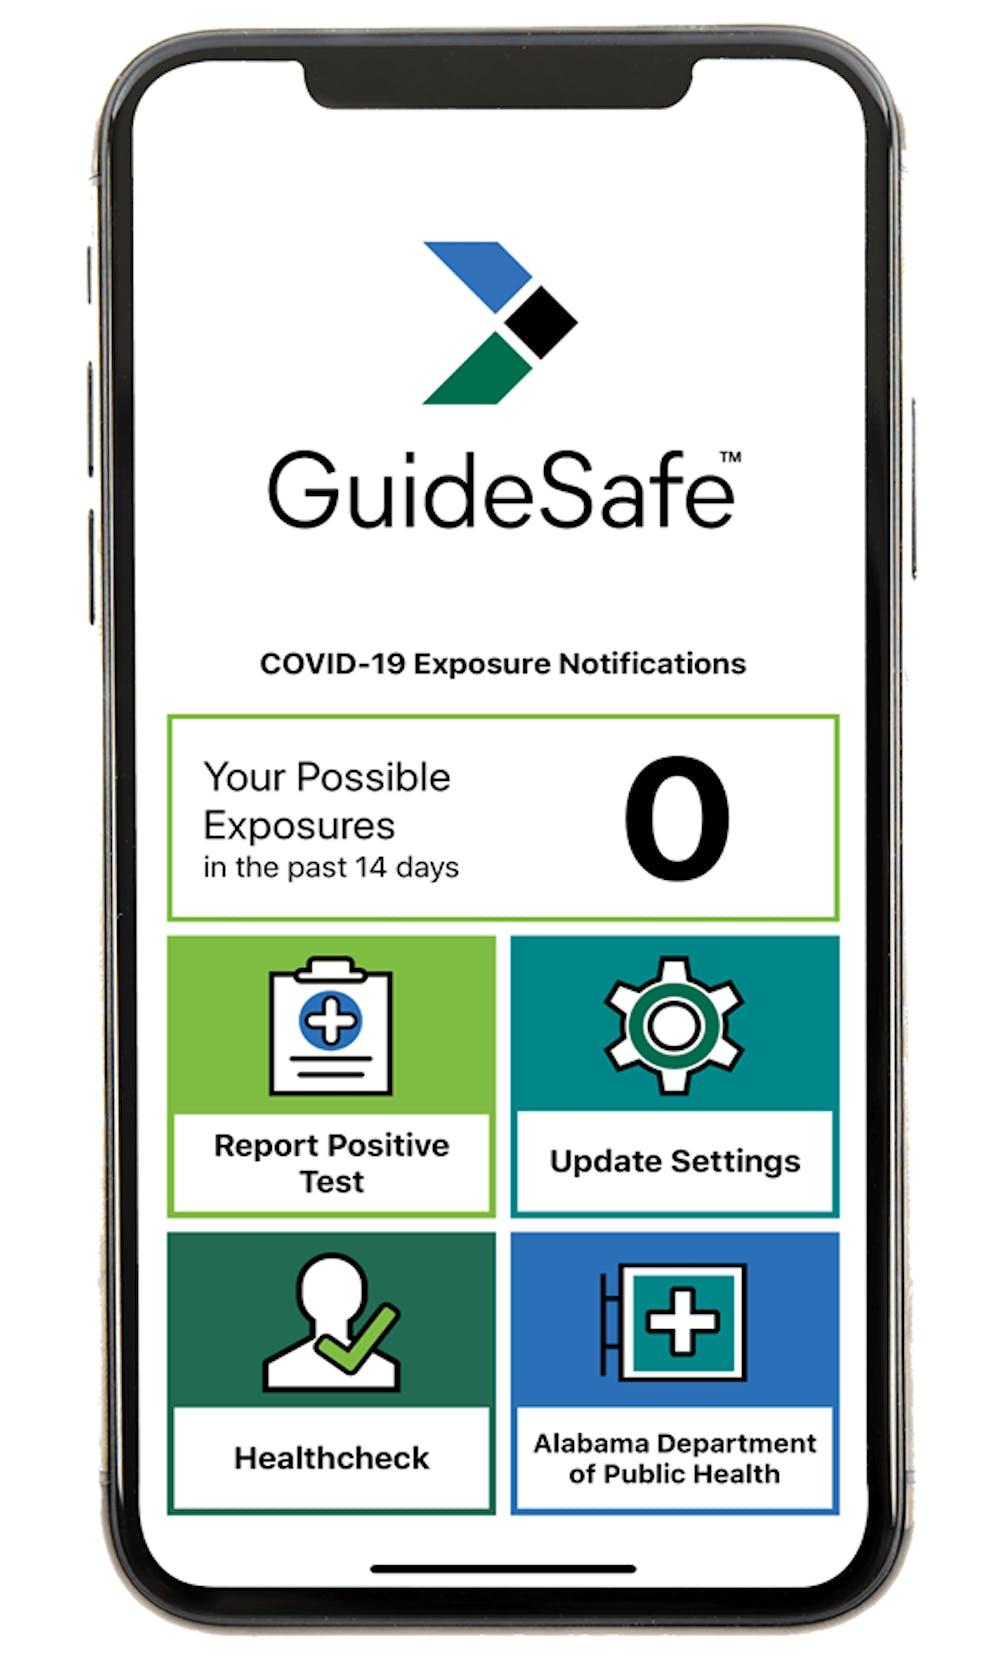 guidesafe-app